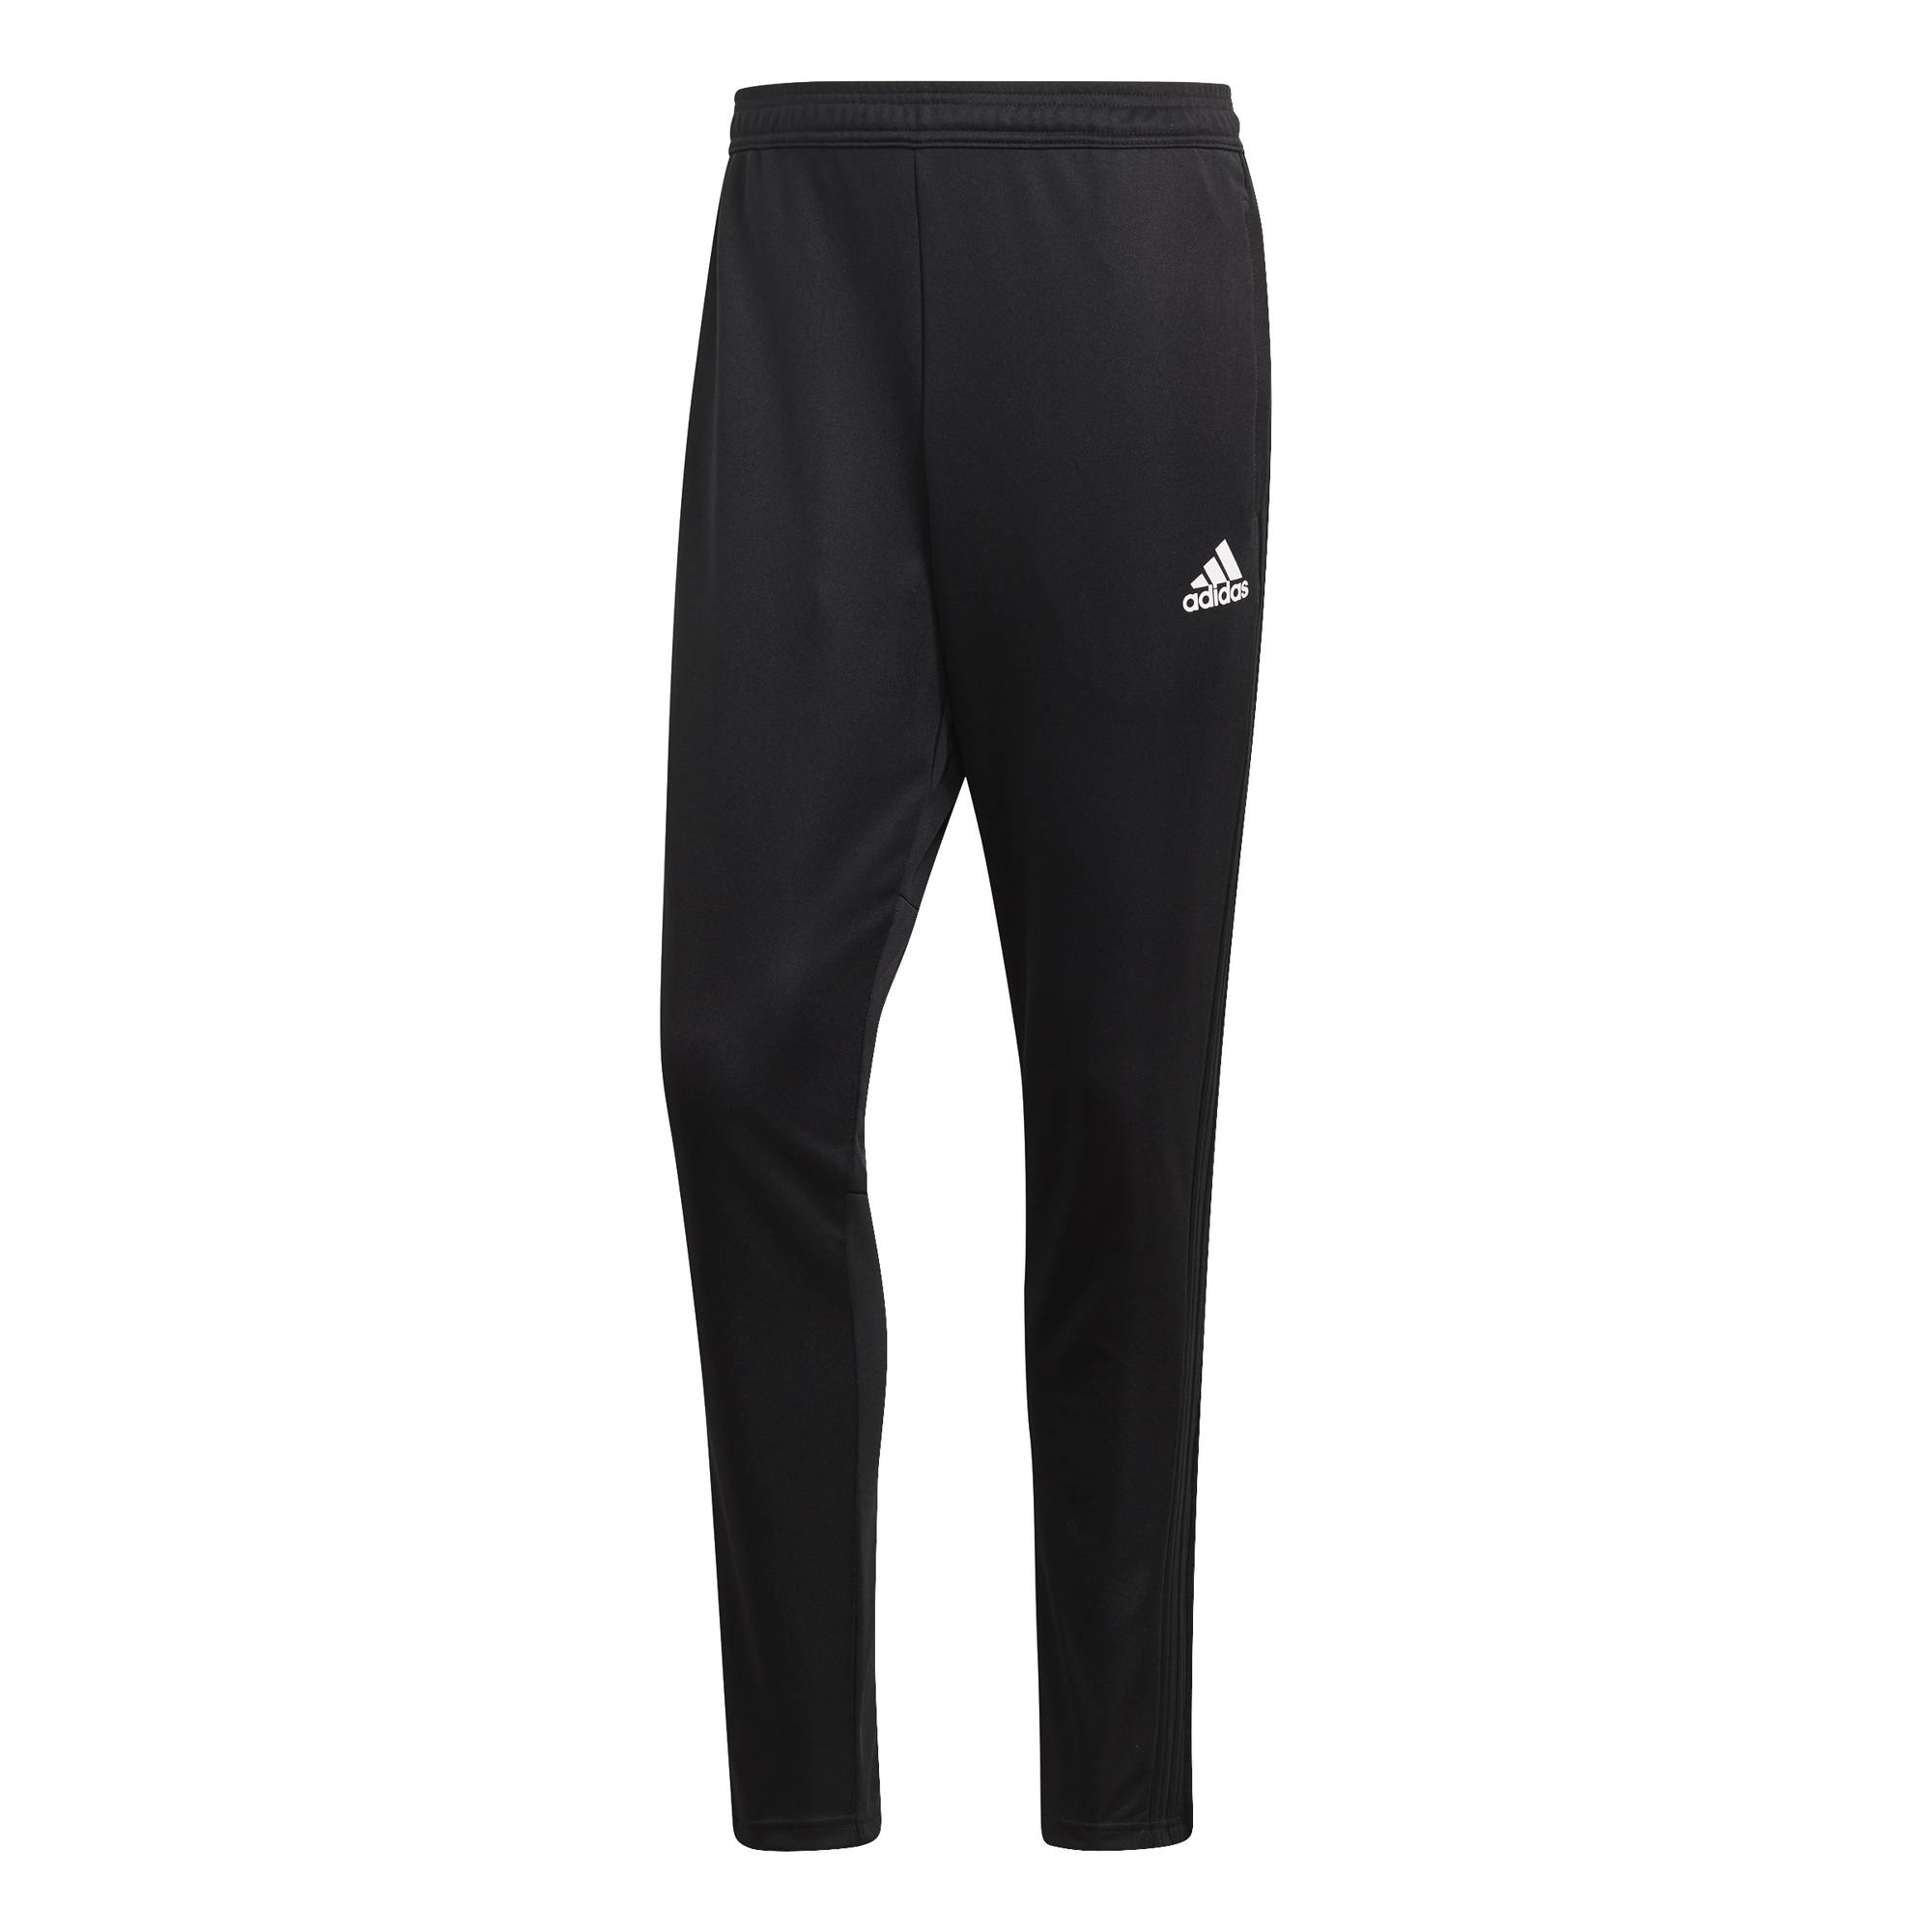 ADIDAS tréninkové kalhoty Condivo 18 s úzkým střihem